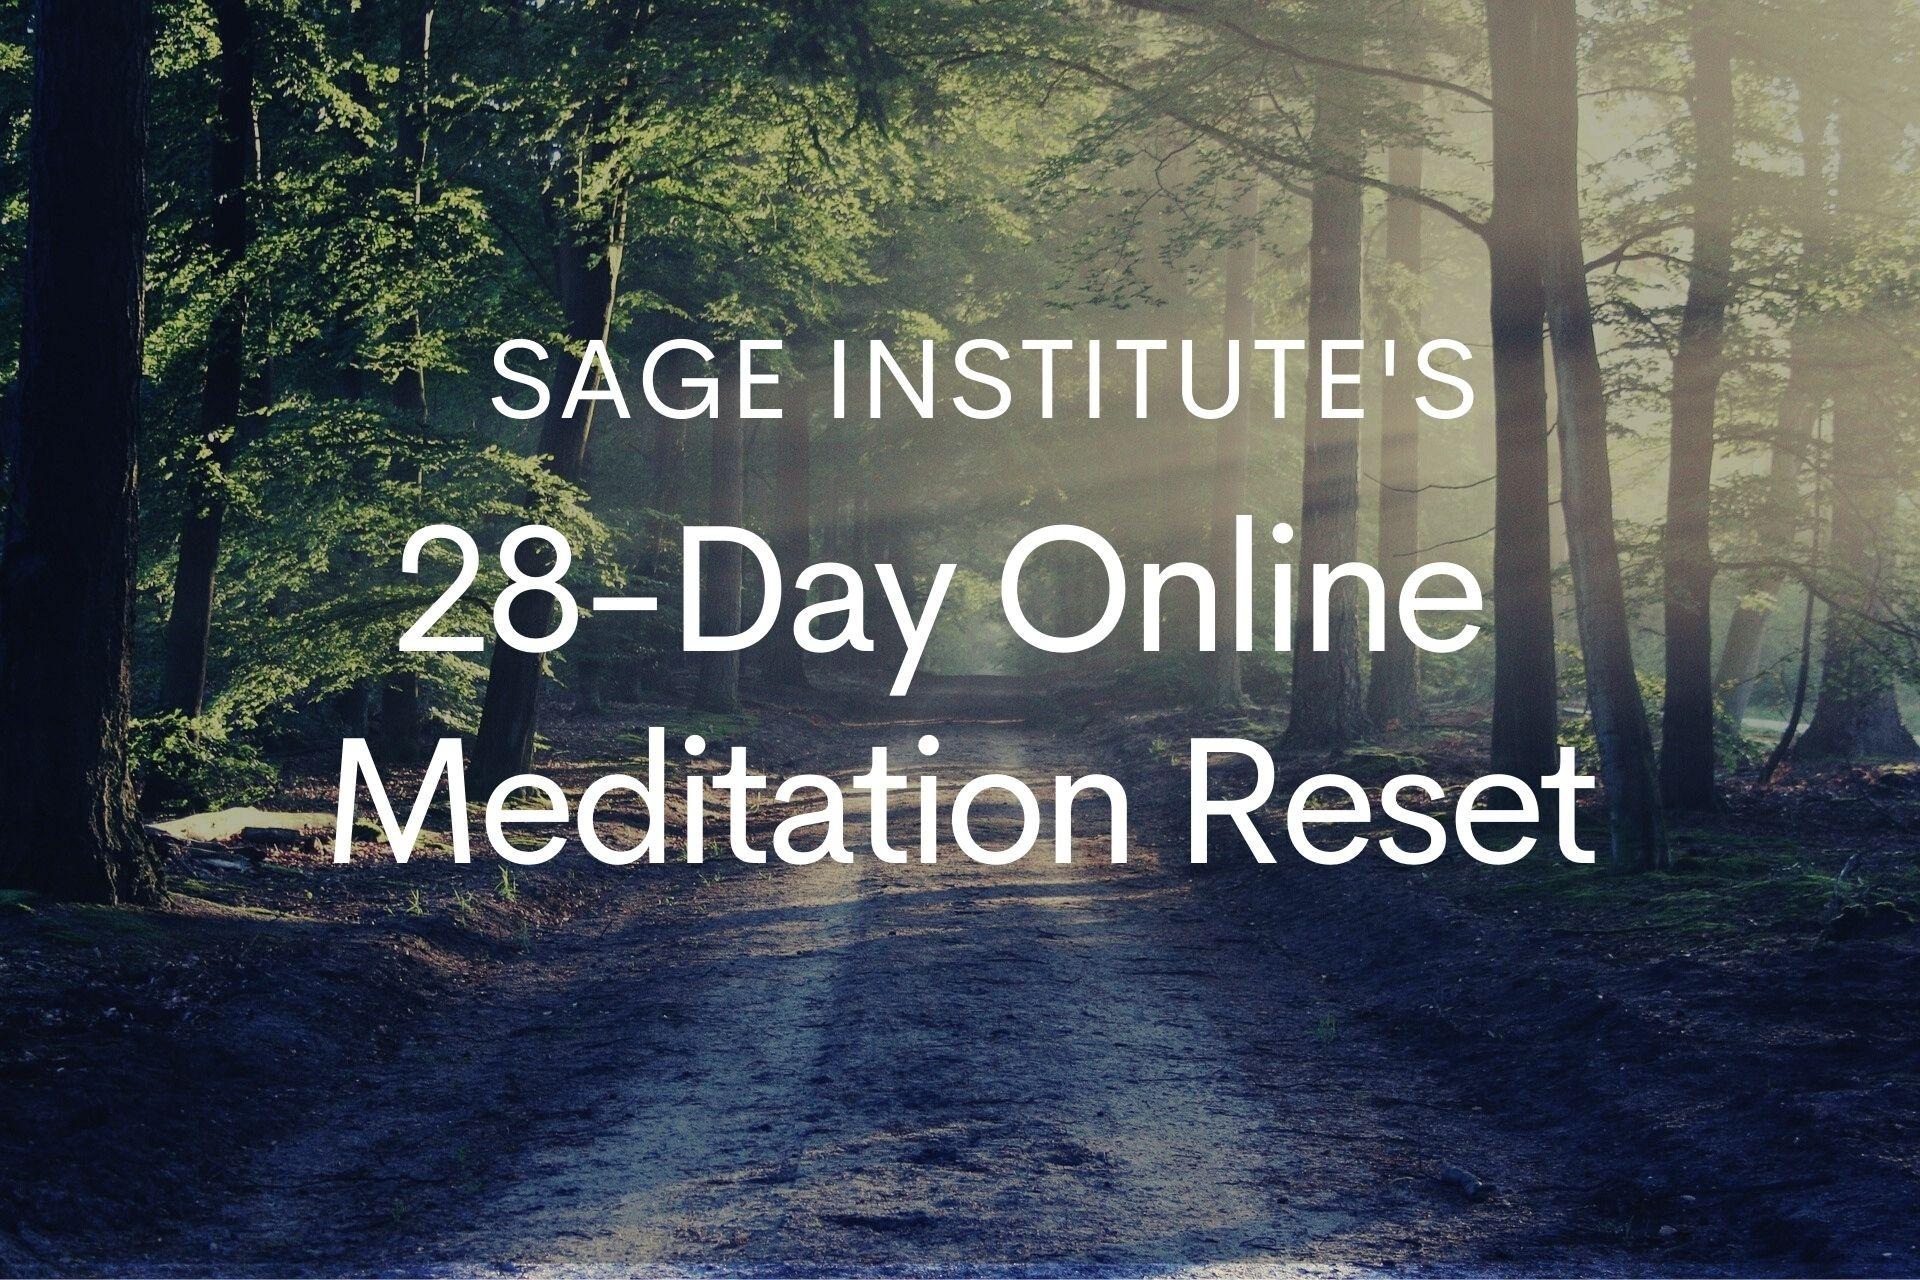 Sage Institute's 28-Day Online Meditation Reset